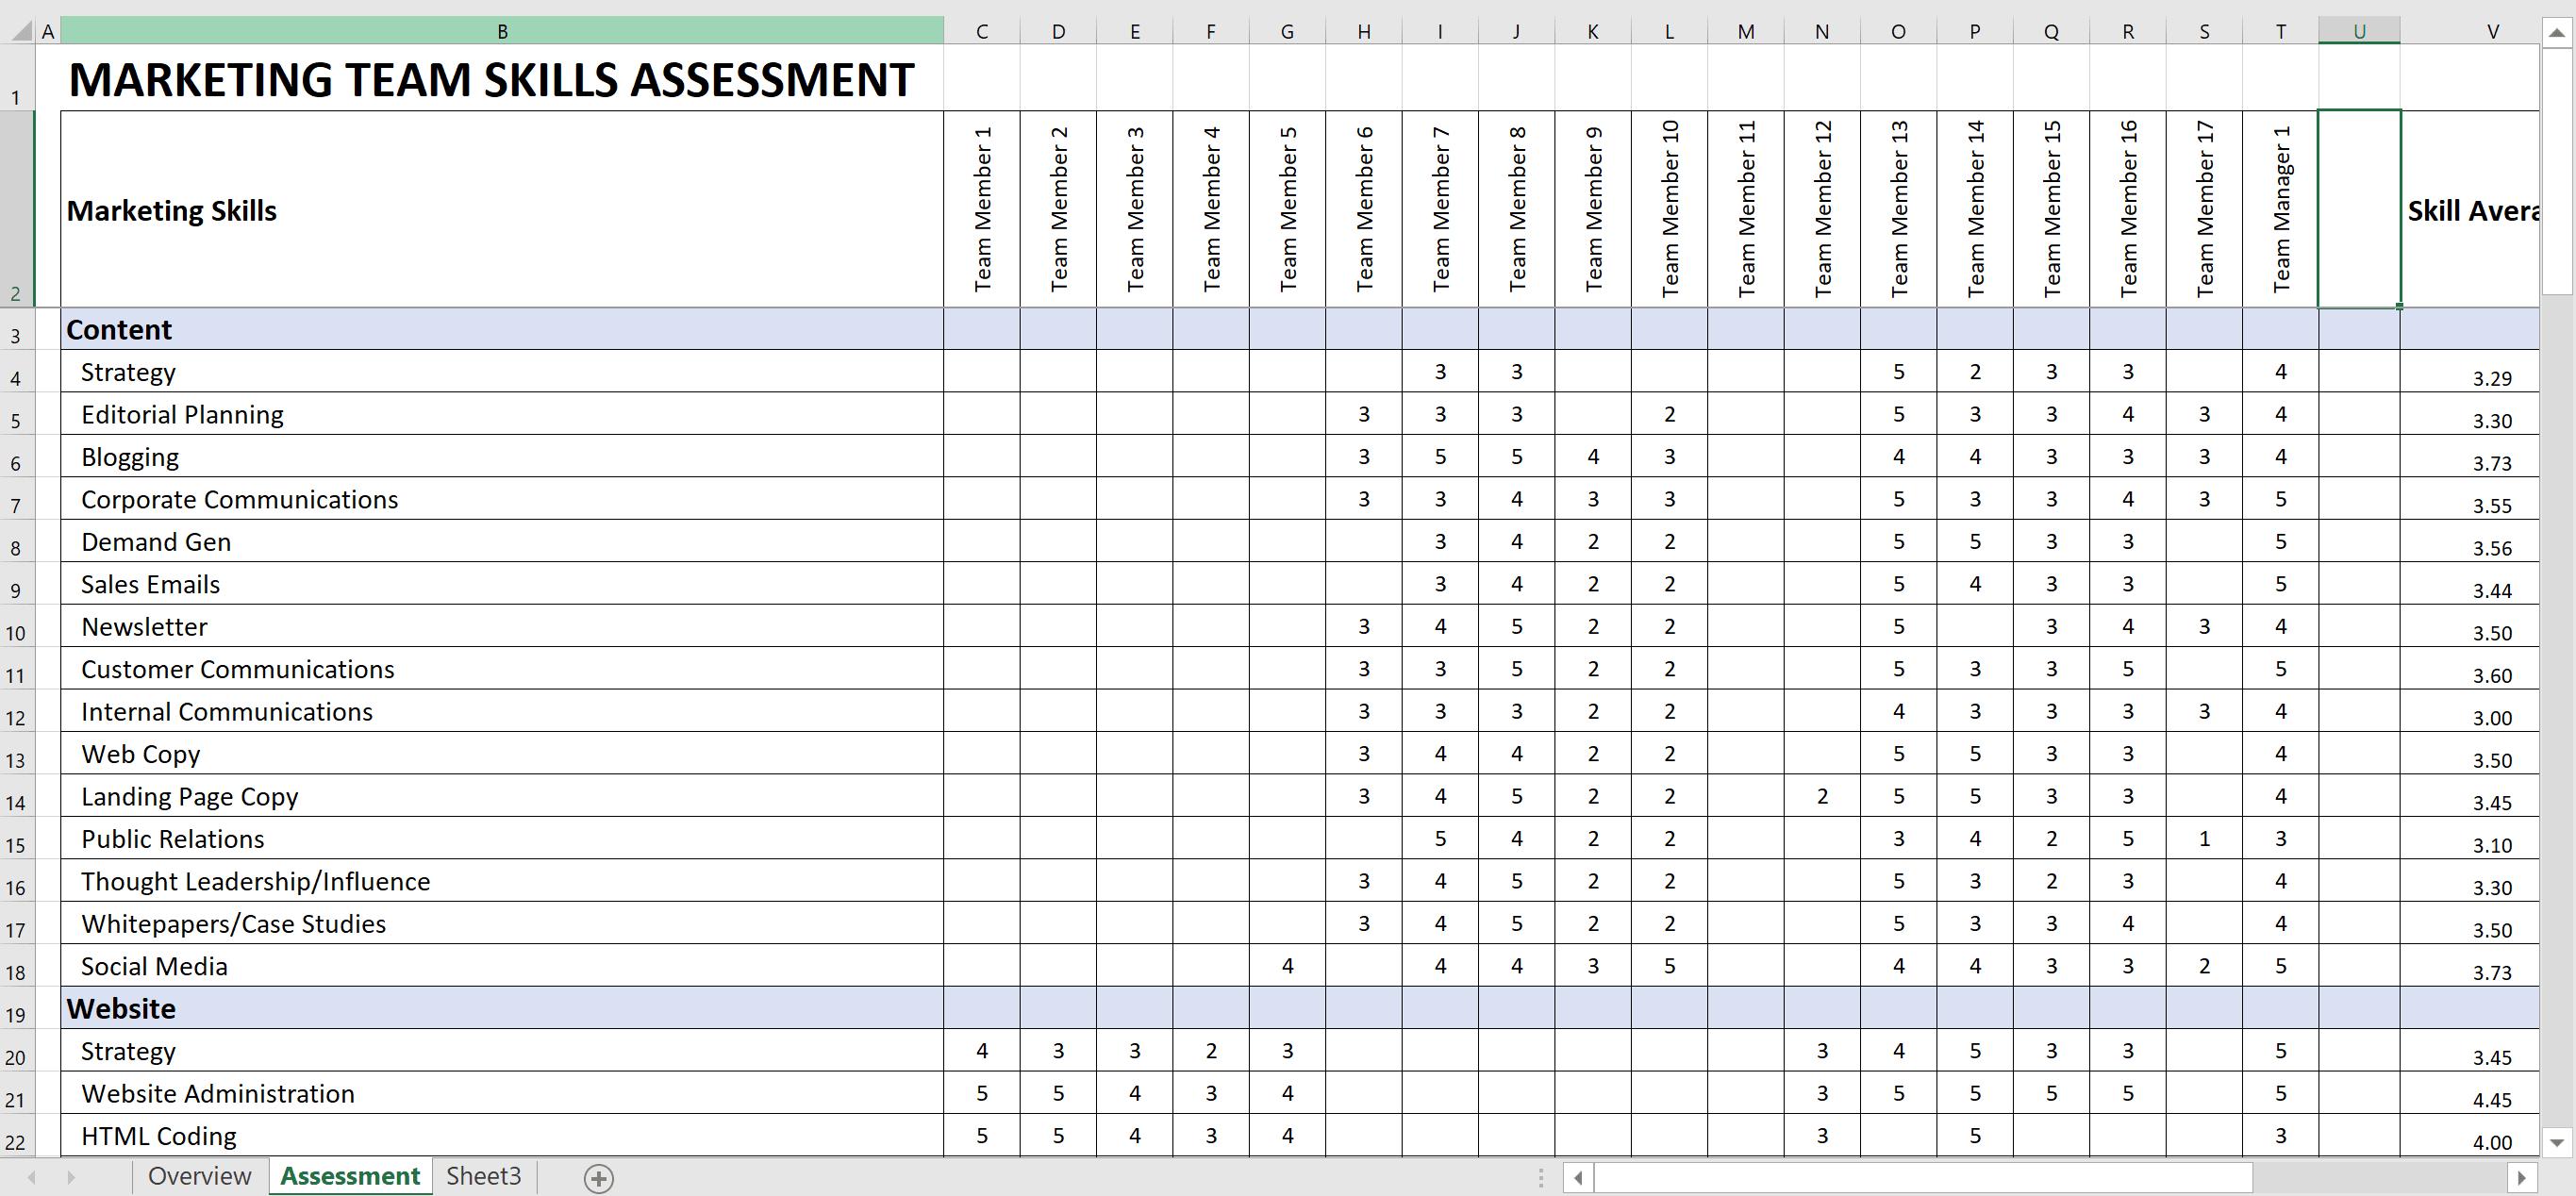 test alt text